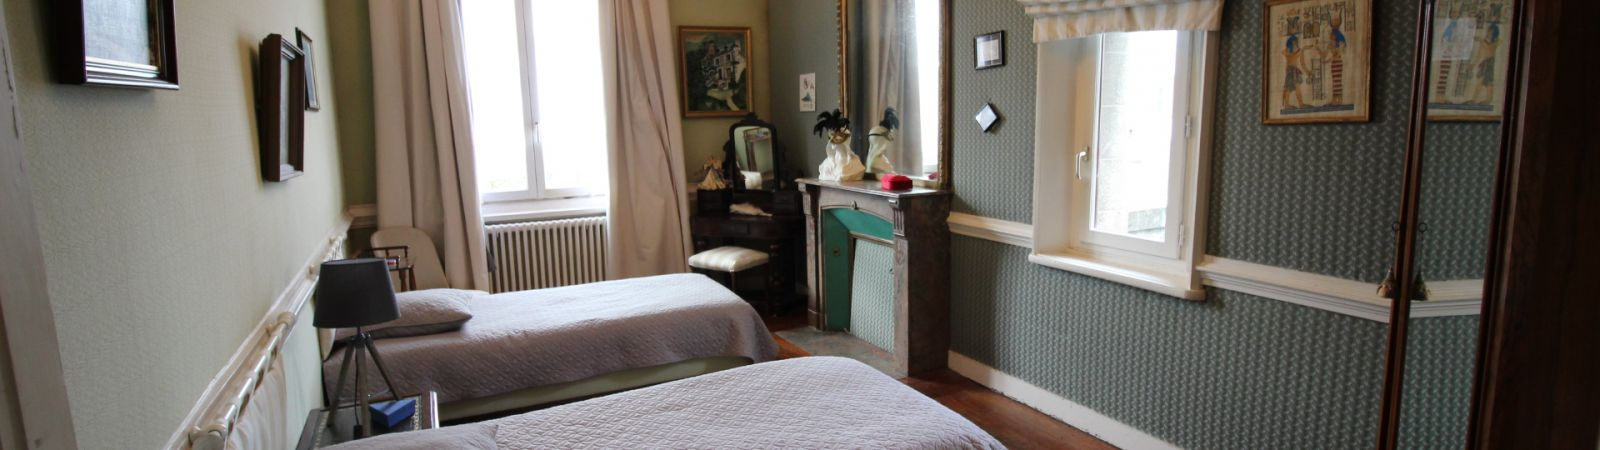 photo 9: Somptueuse demeure du XIXème siècle